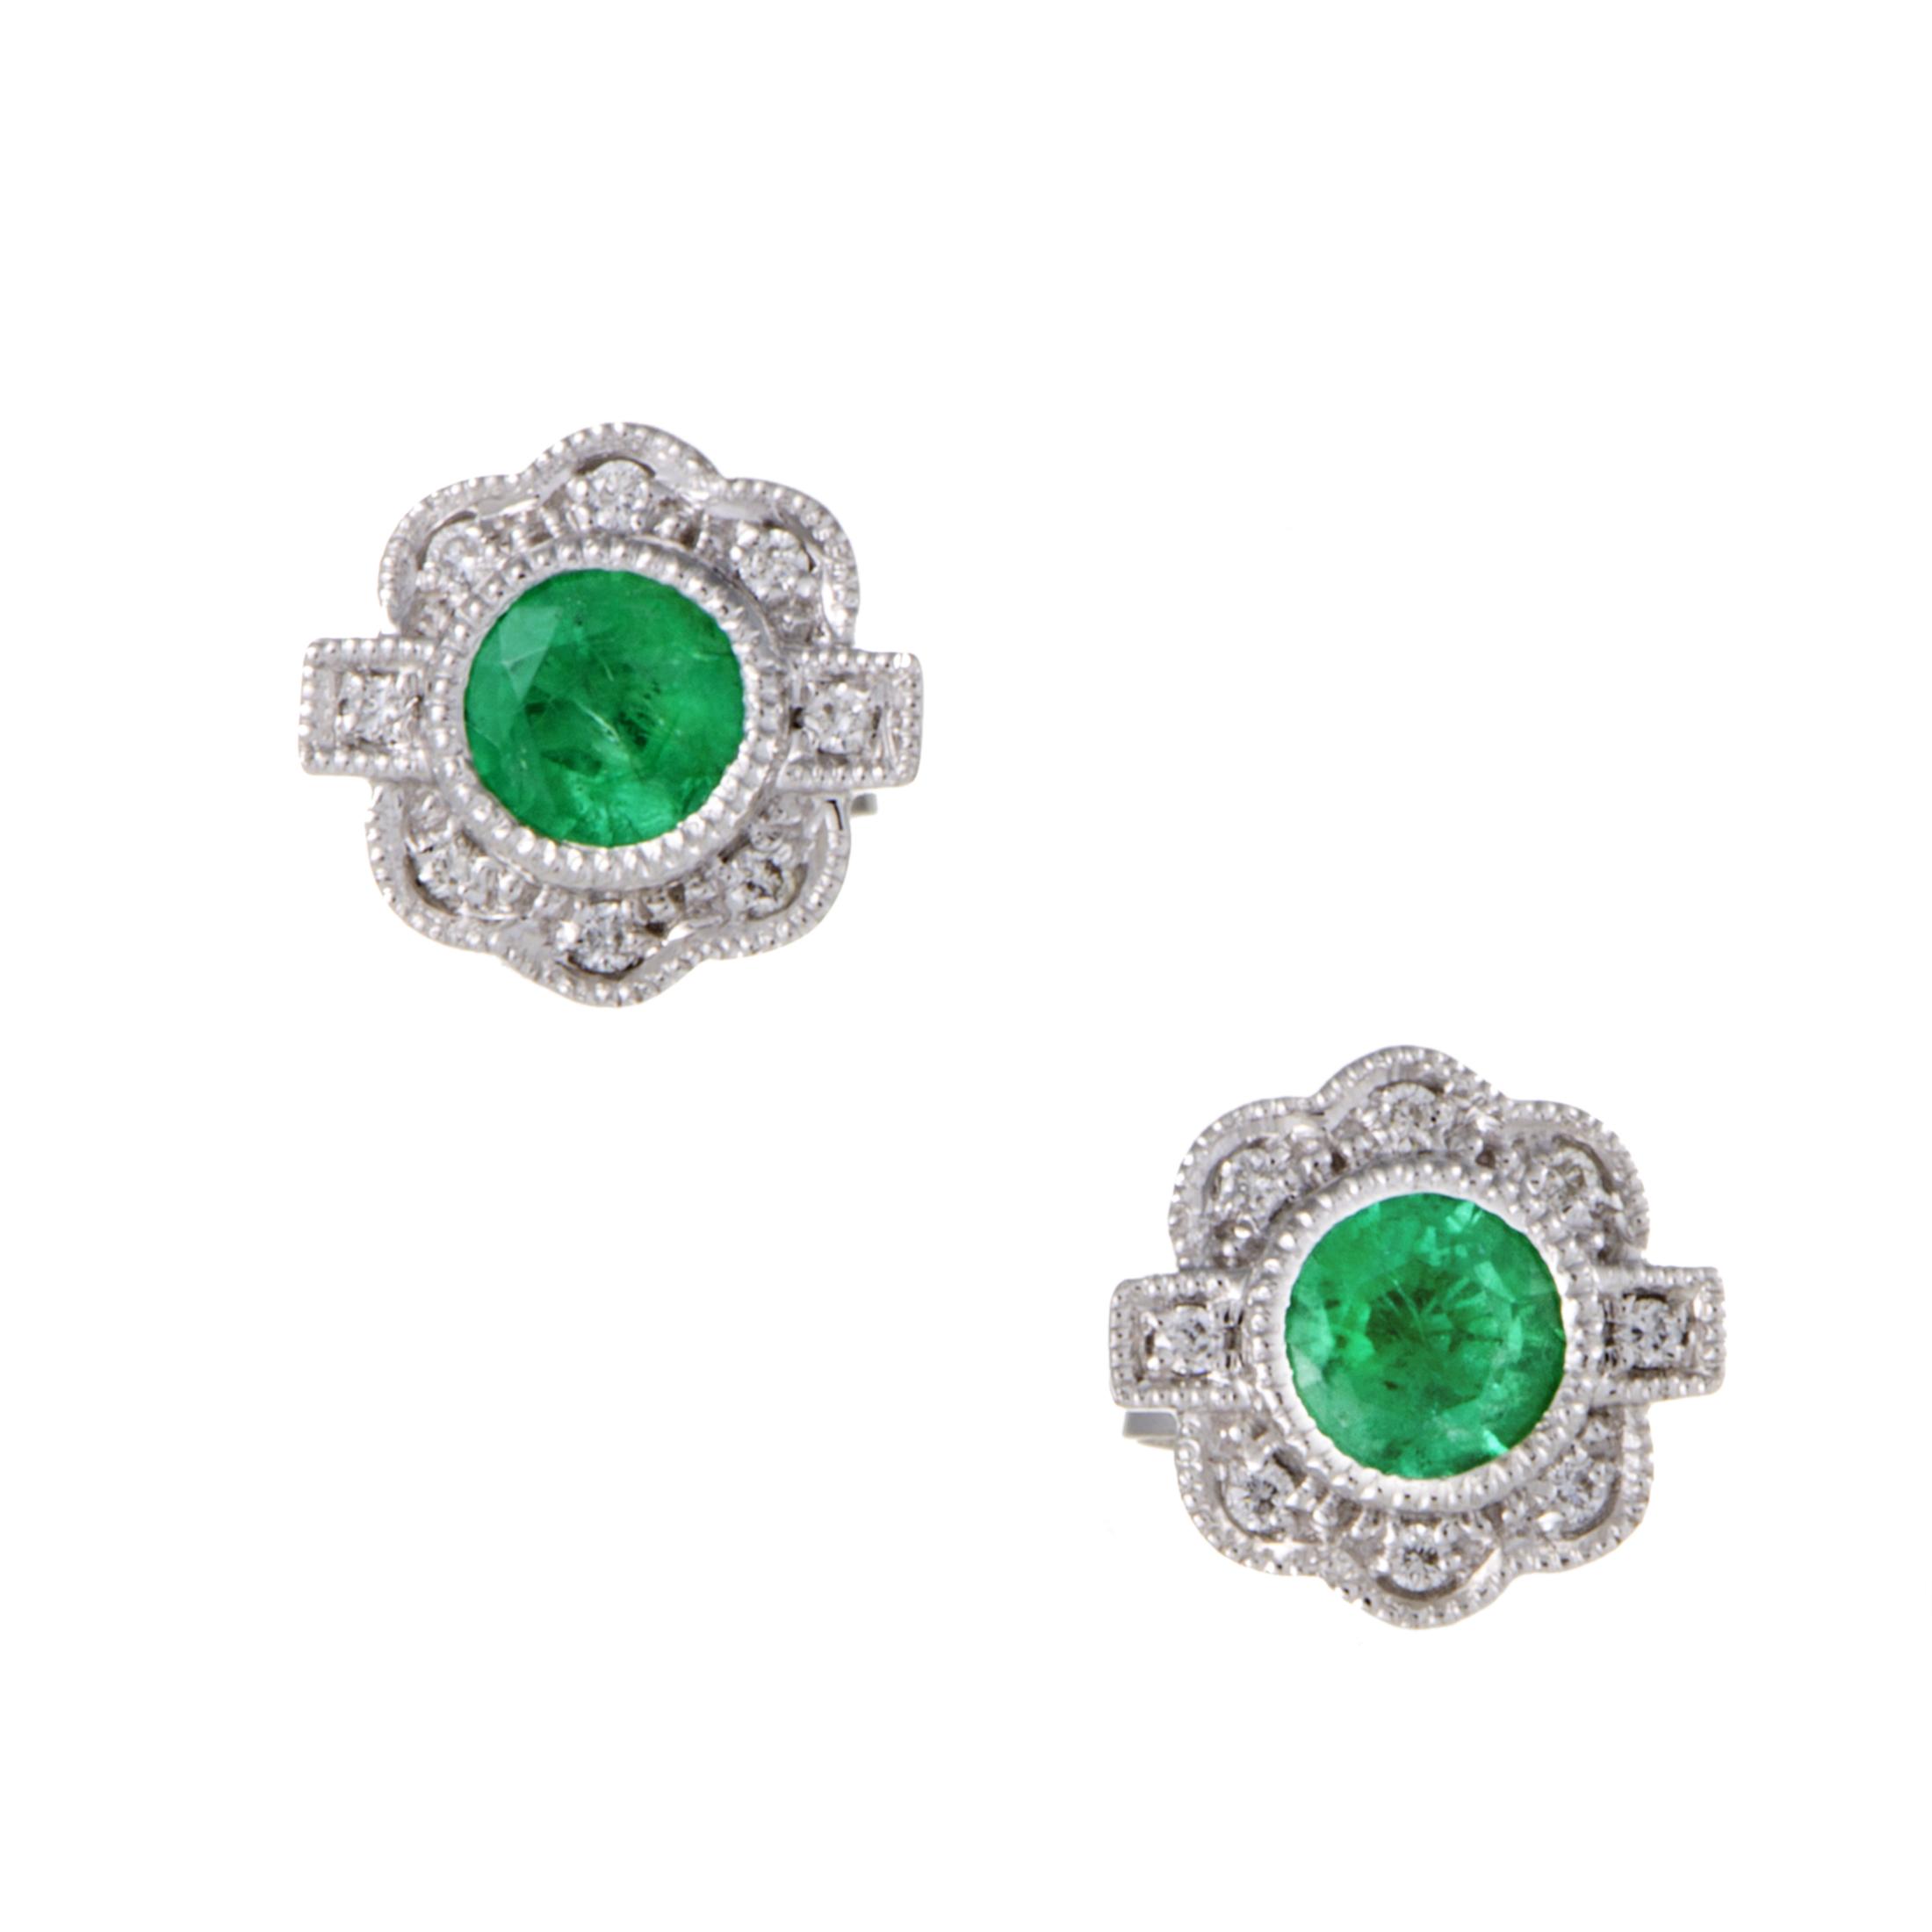 Womens 18K White Gold Diamond and Emerald Stud Earrings